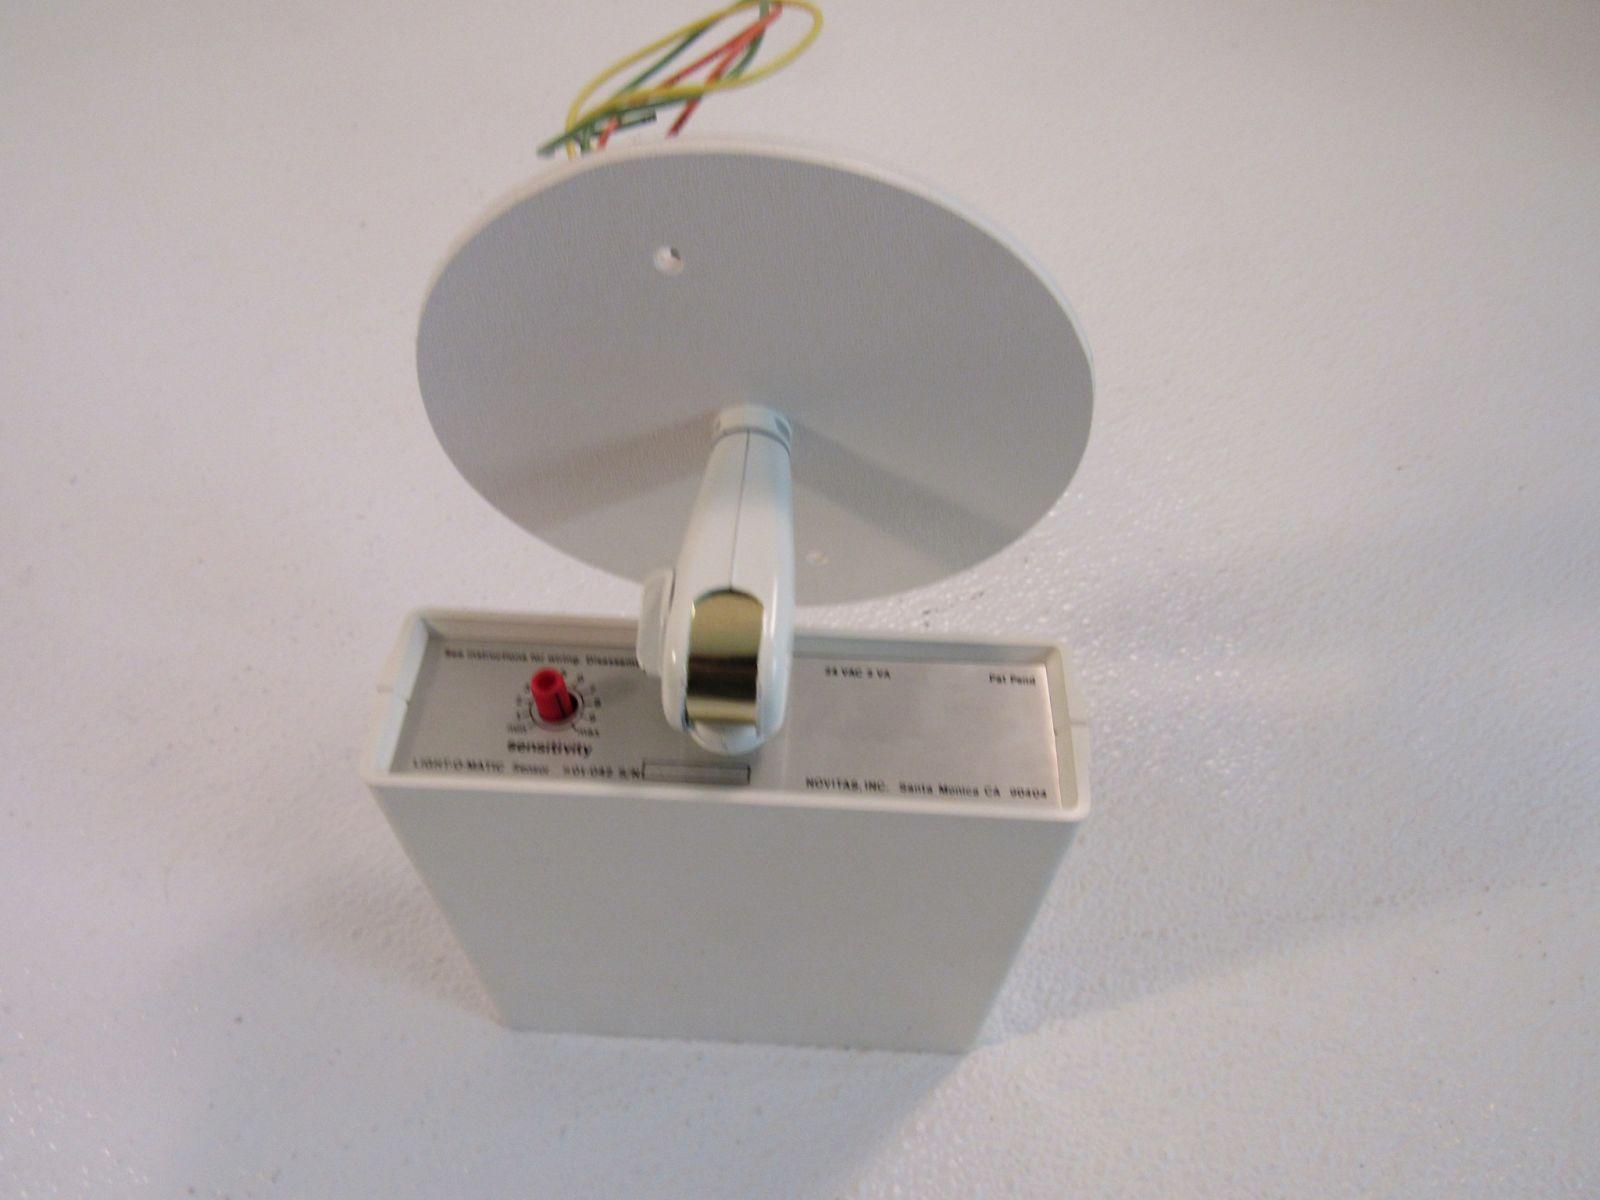 Novitas Light-O-Matic Auxiliary Sensor White 01-042